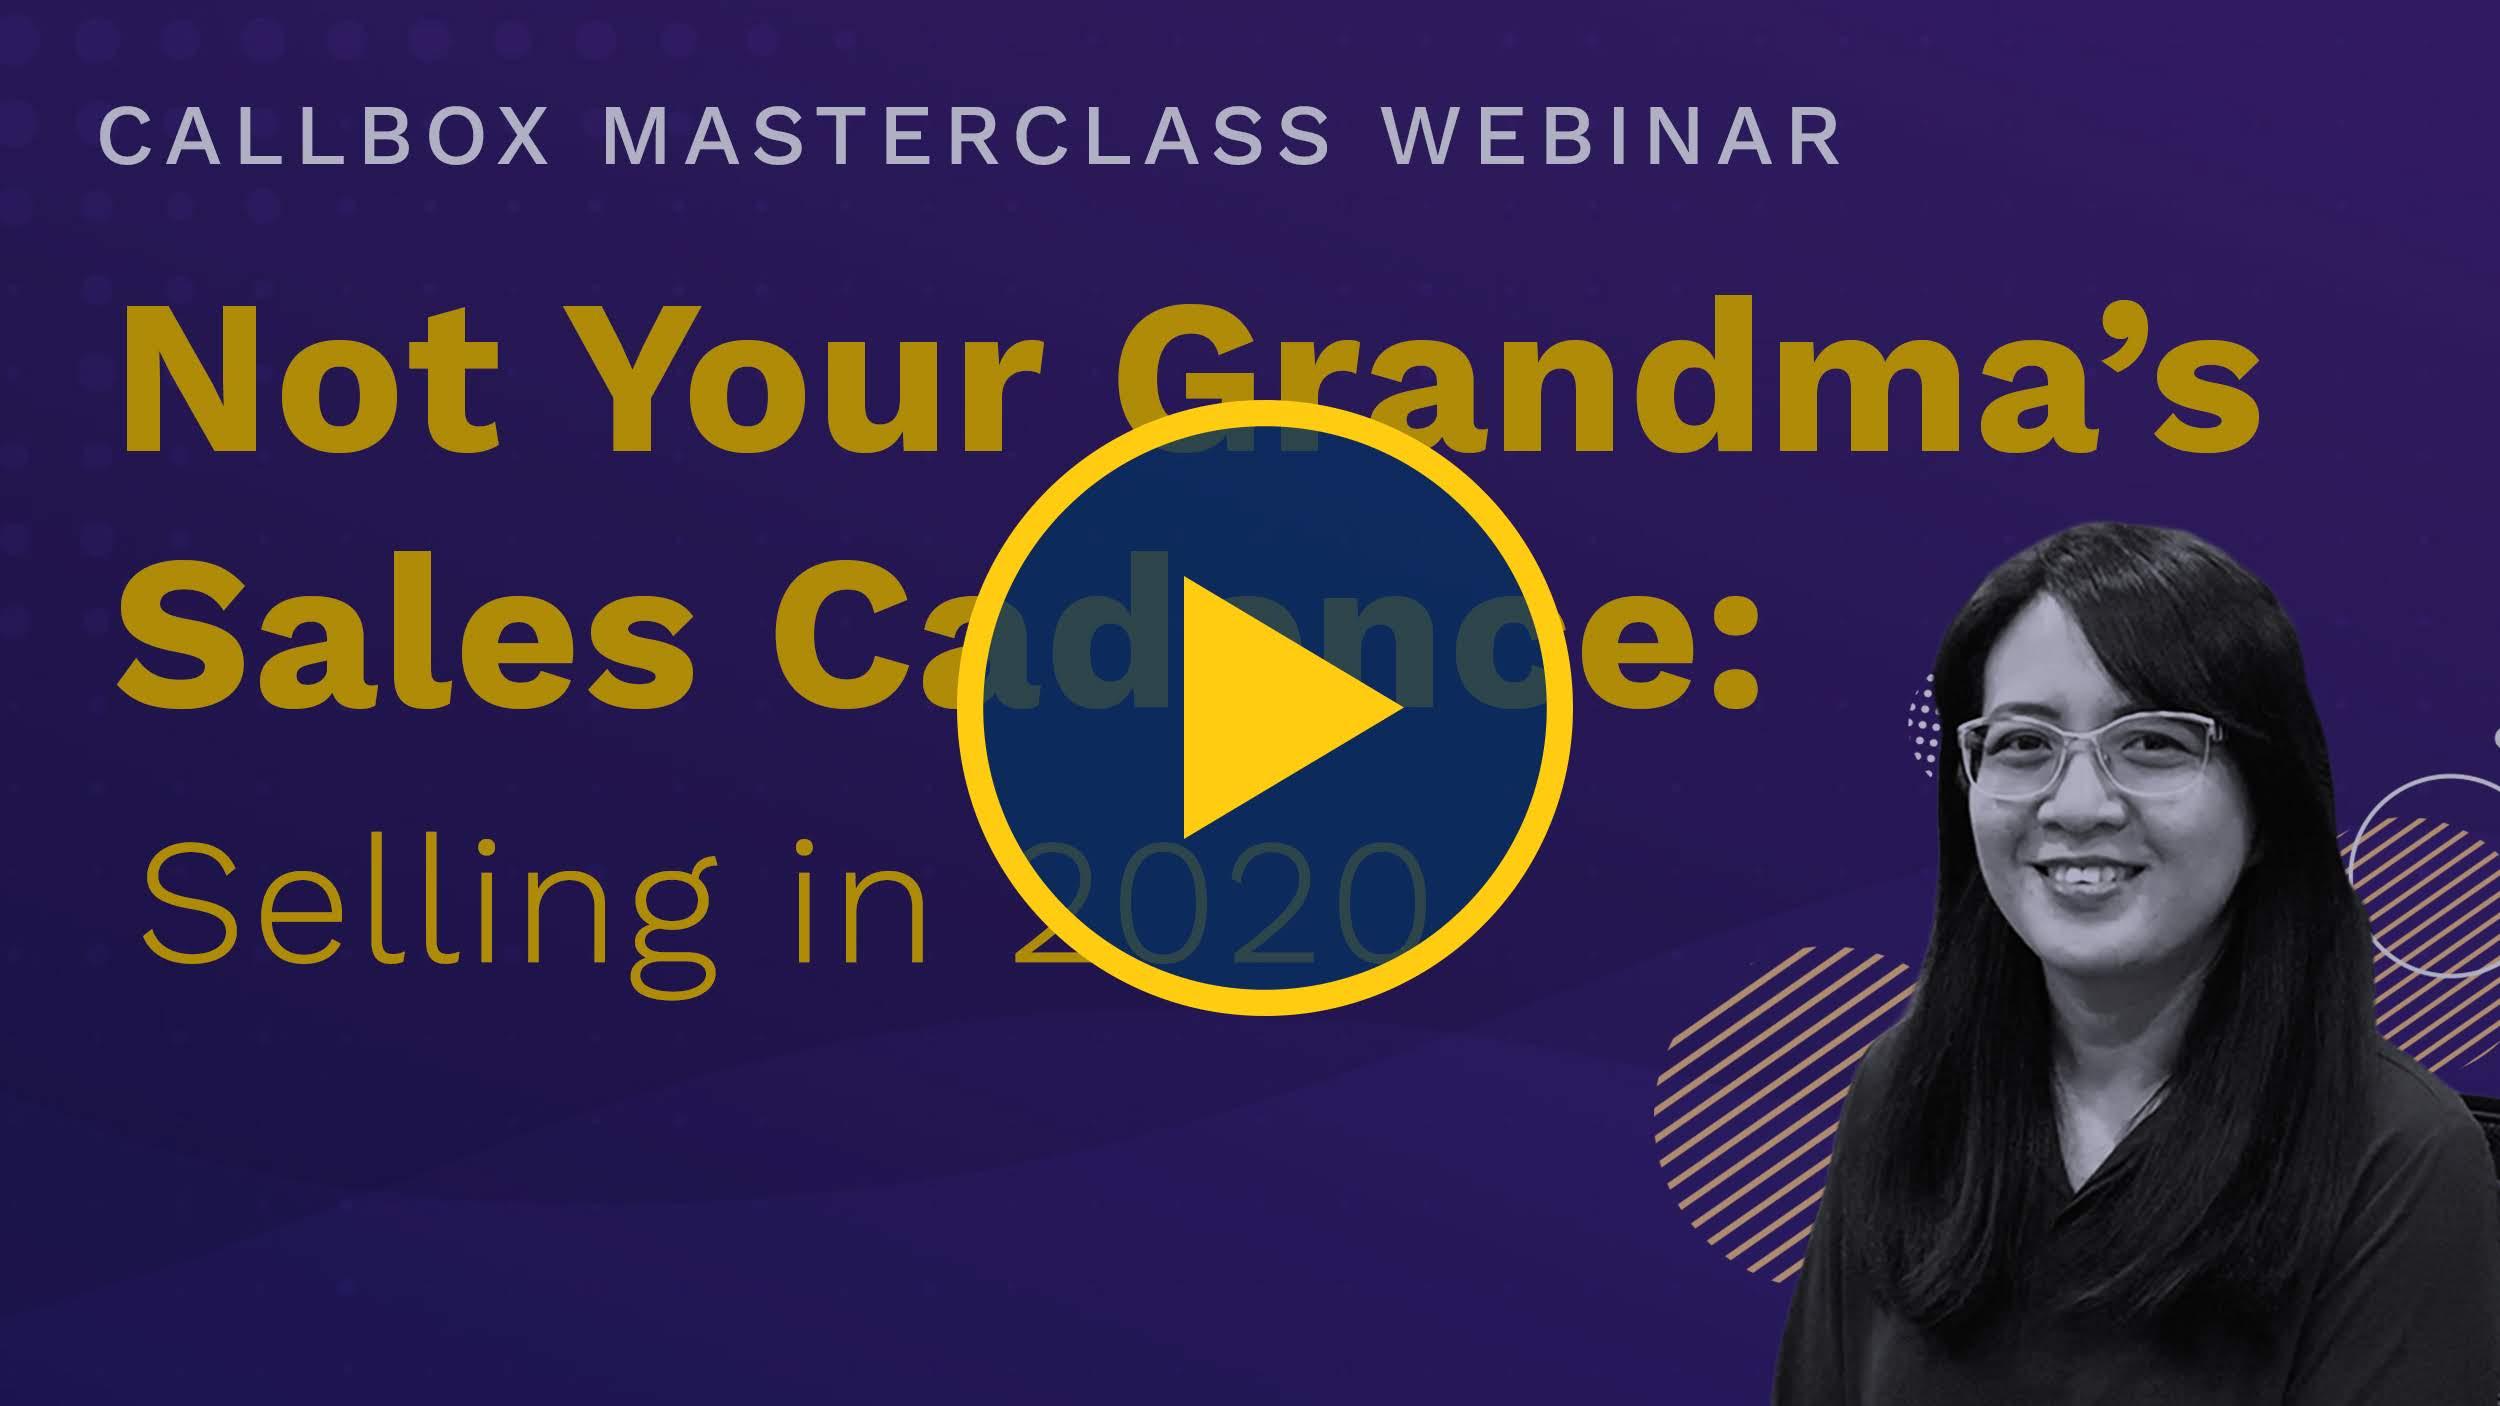 Not-Your-Grandmas-Sales-Cadence-Selling-in-2020